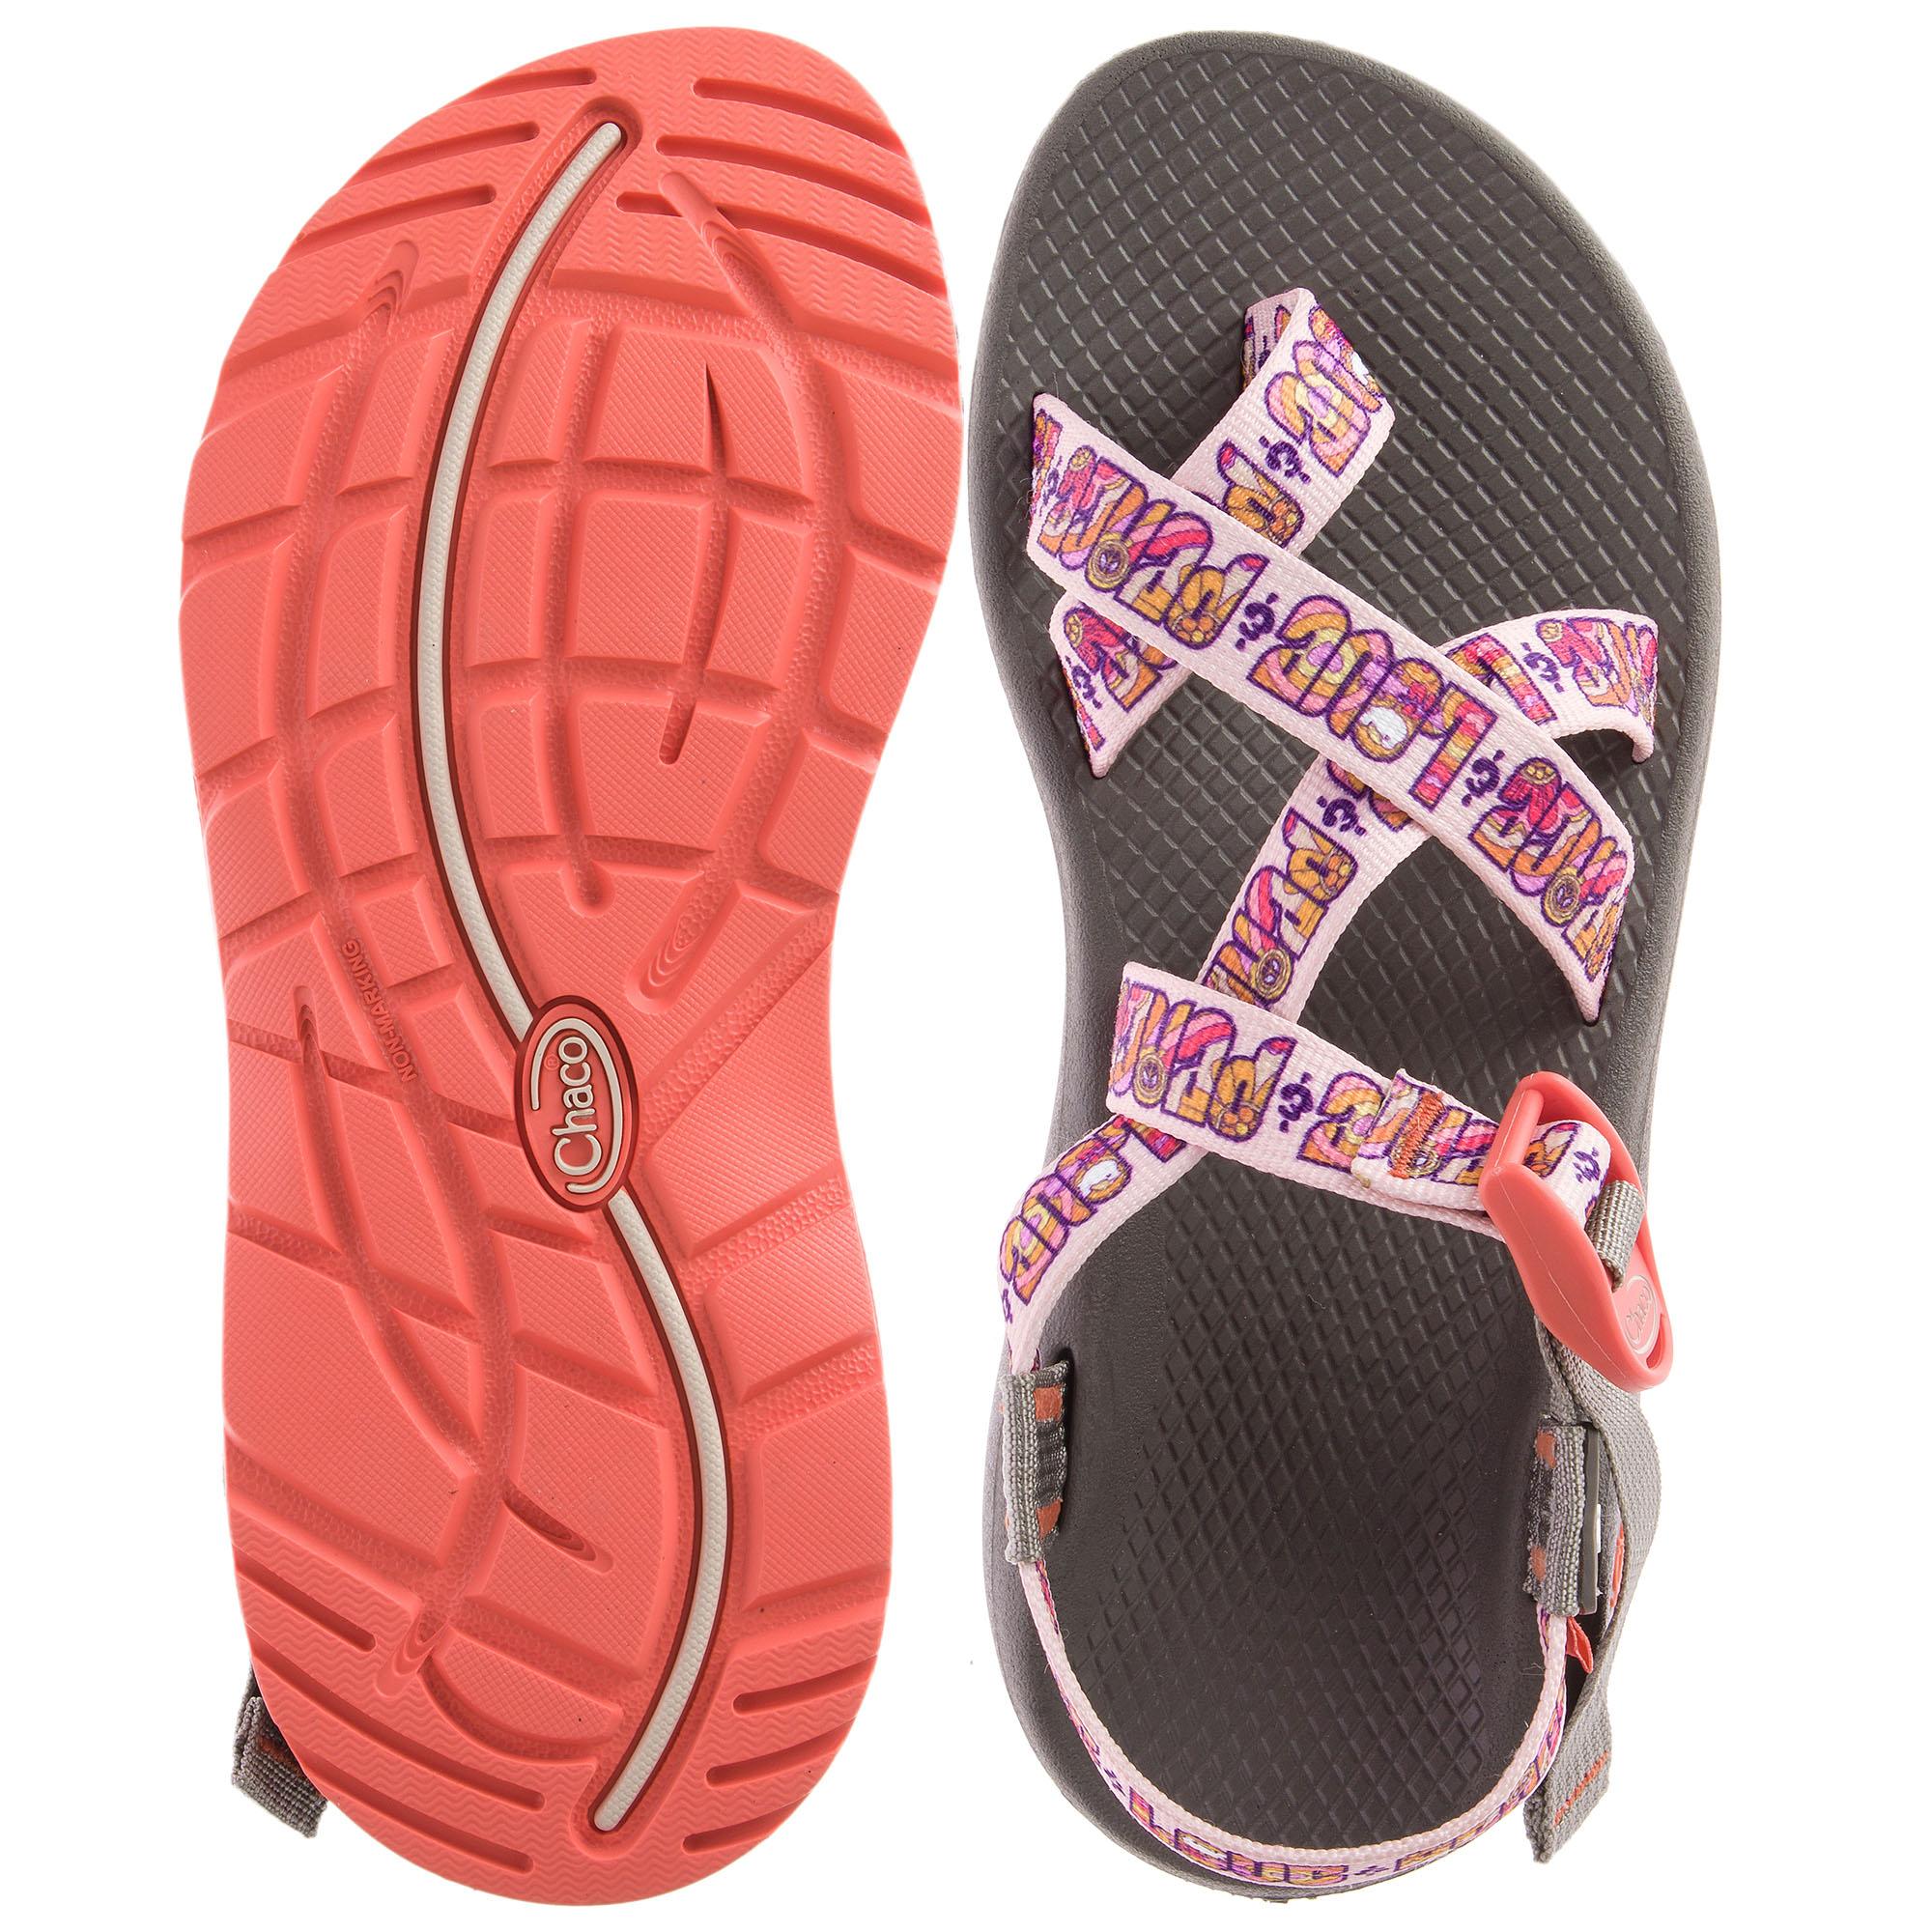 2bf8ec700677 Chaco Women s Z Cloud 2 Woodstock Sandals - Sun   Ski Sports